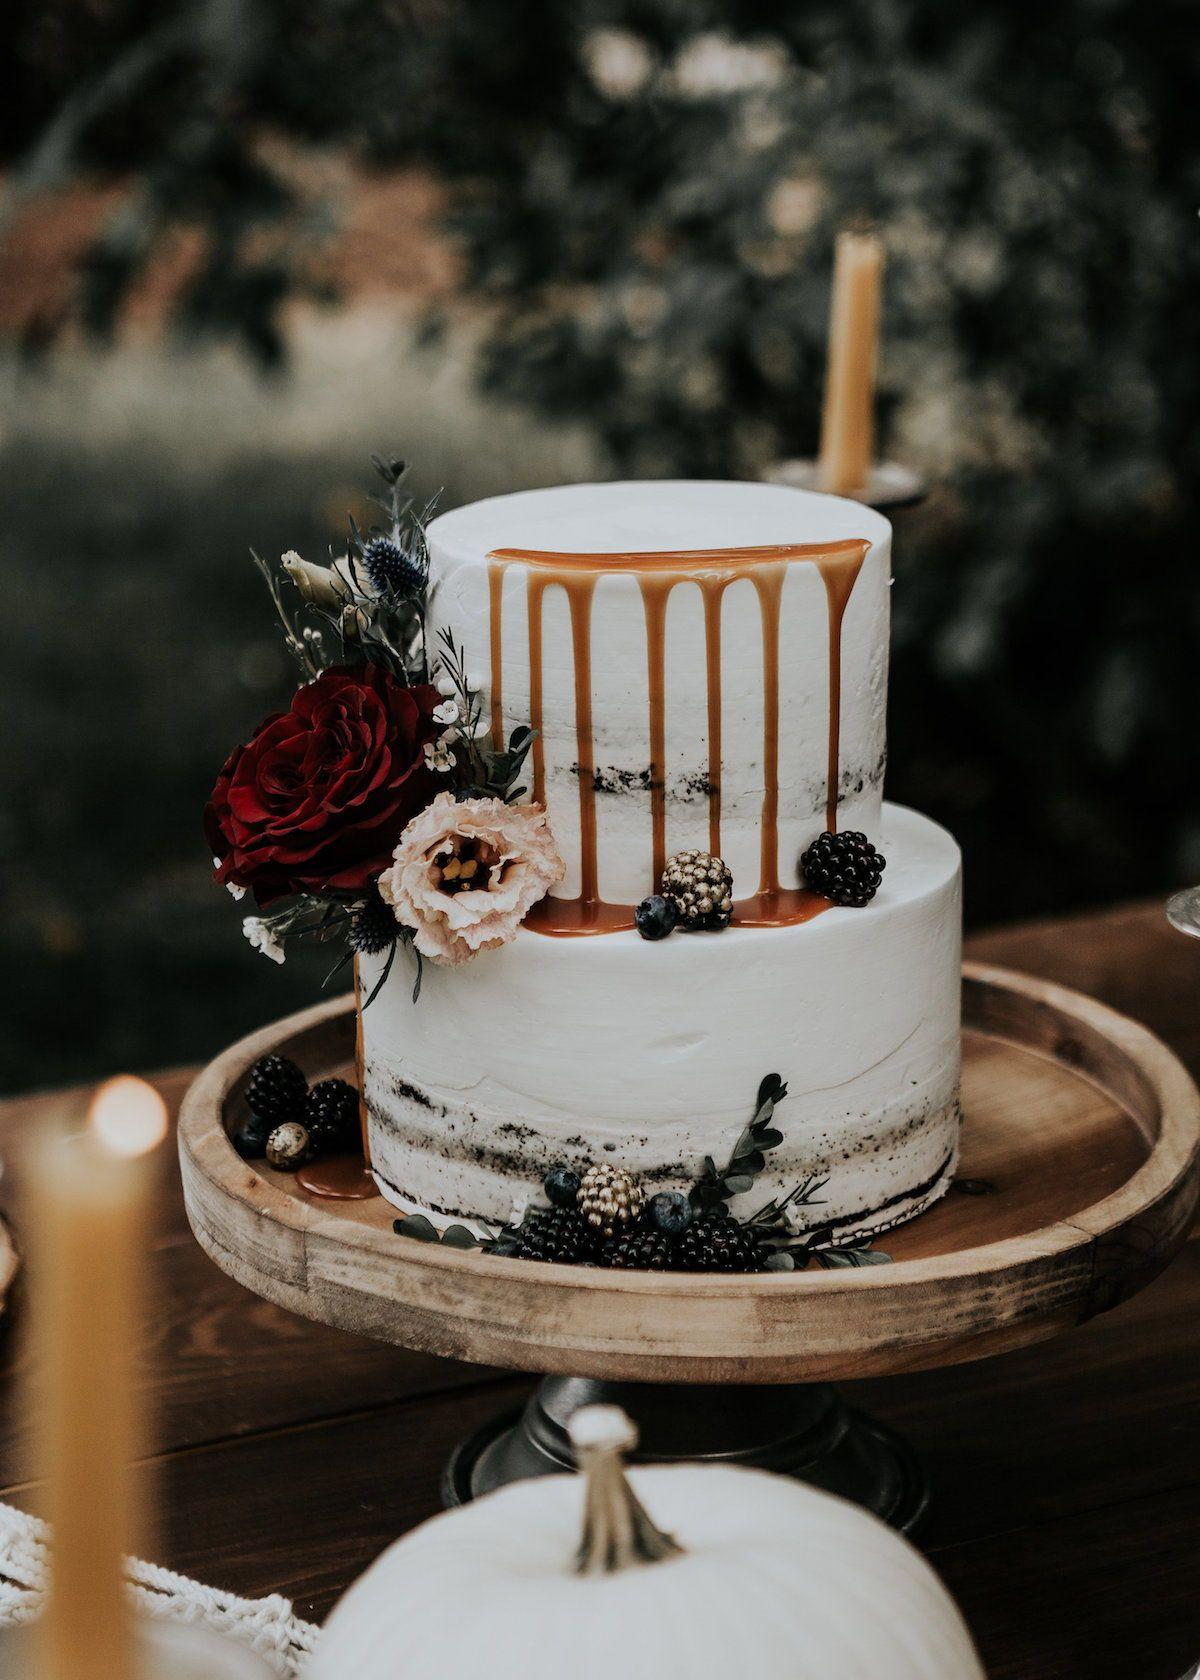 Lush Fall Wedding Inspiration With Macrame And Pumpkin Details Love Inc Mag Wedding Inspiration Fall Wedding Cake Toppers Fall Wedding Cakes